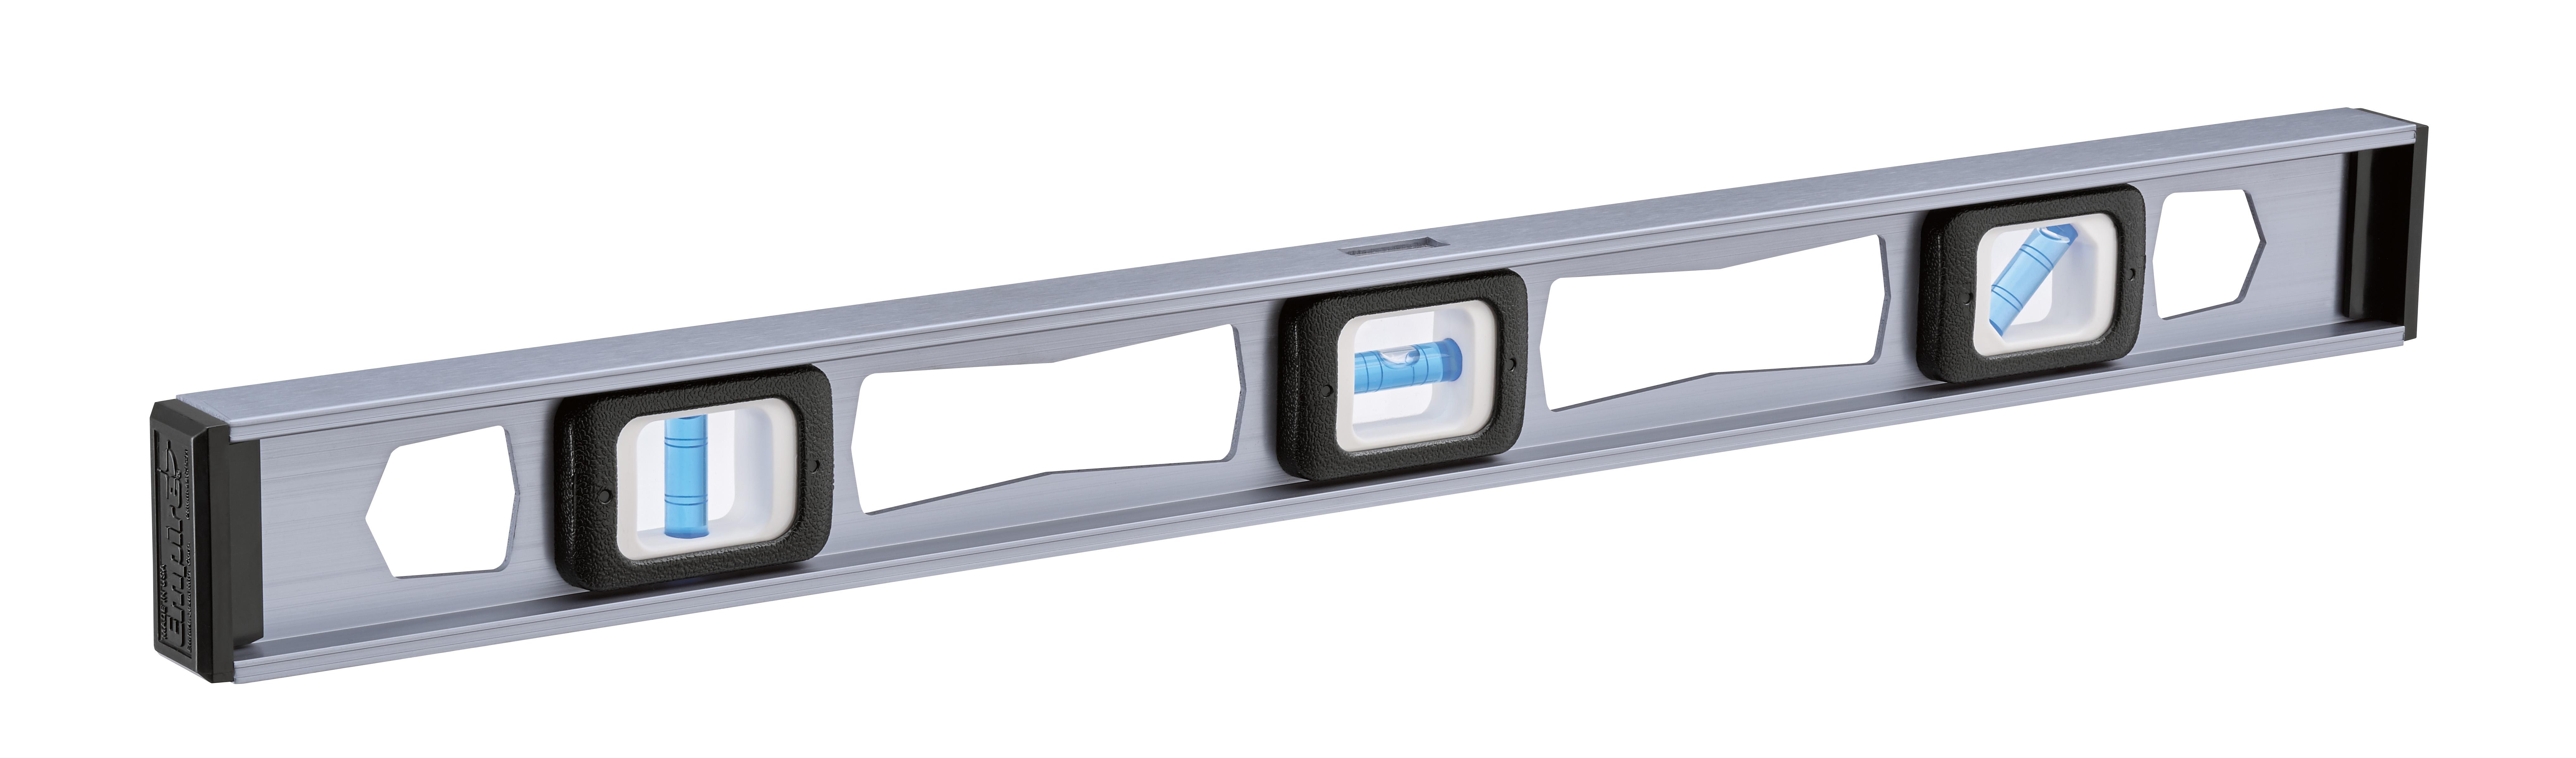 Milwaukee® Empire® TRUE BLUE® EM81.24 Heavy Duty Magnetic Professional I-Beam Level, 24 in L, 3 Vials, Aluminum, (1) 45 deg, (1) Level, (1) Plumb Vial Position, 0.0005 in Accuracy